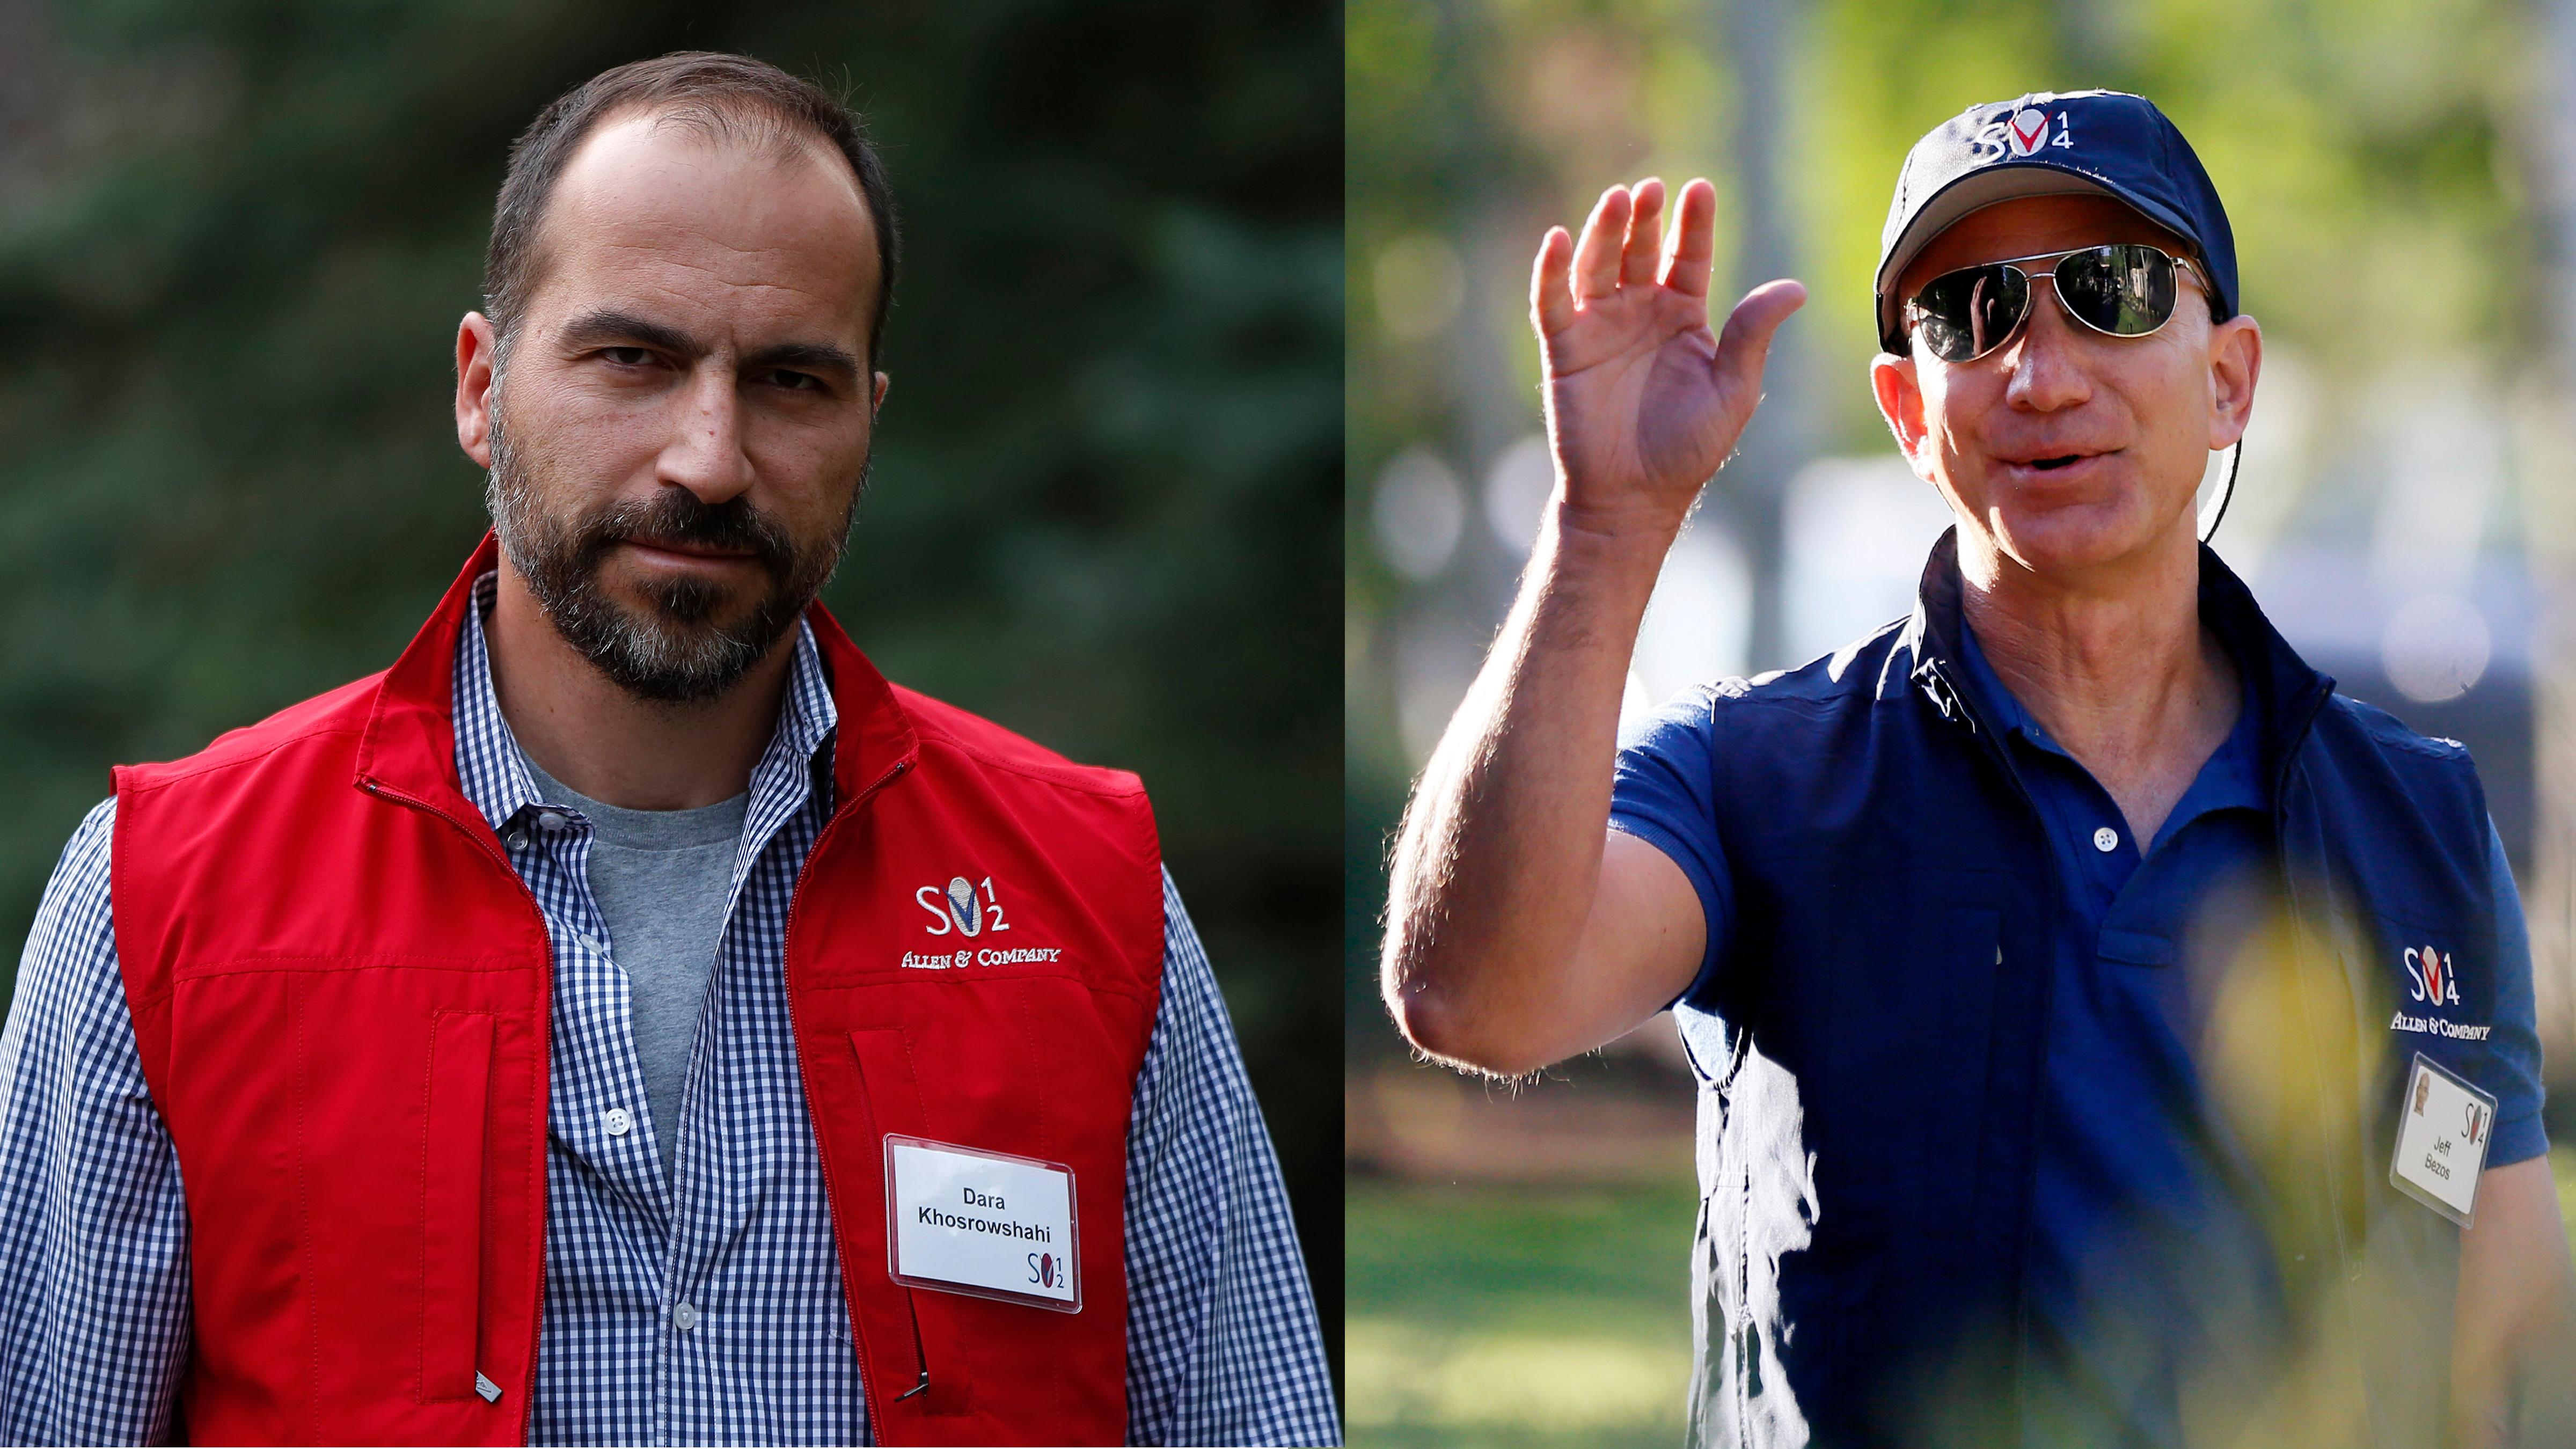 Uber CEO Dara Khosrowshahi and Amazon CEO Jeff Bezos.